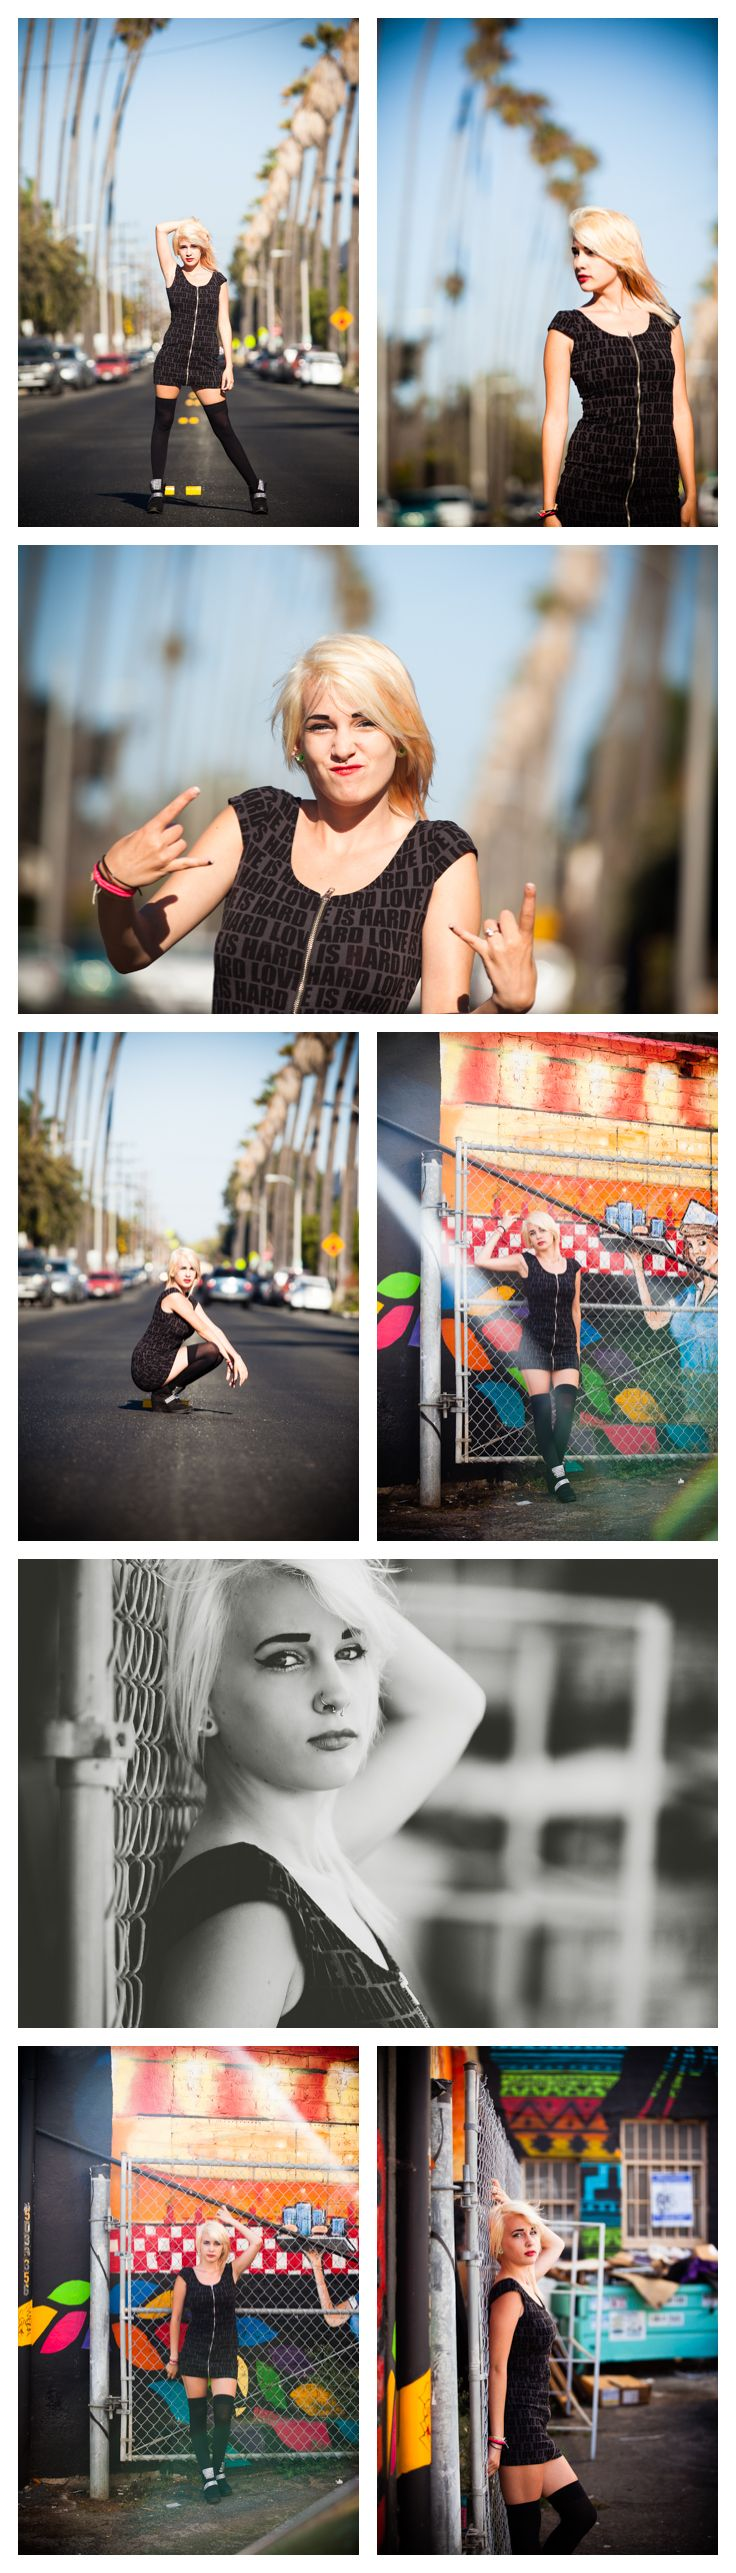 port huron mi los angeles california senior portraits, senior, high school senior, senior pictures, senior pics, teen, teen photography, teen photographer, beach photography, beach, urban photography, urban, streets, street photography, punk, classic, pretty